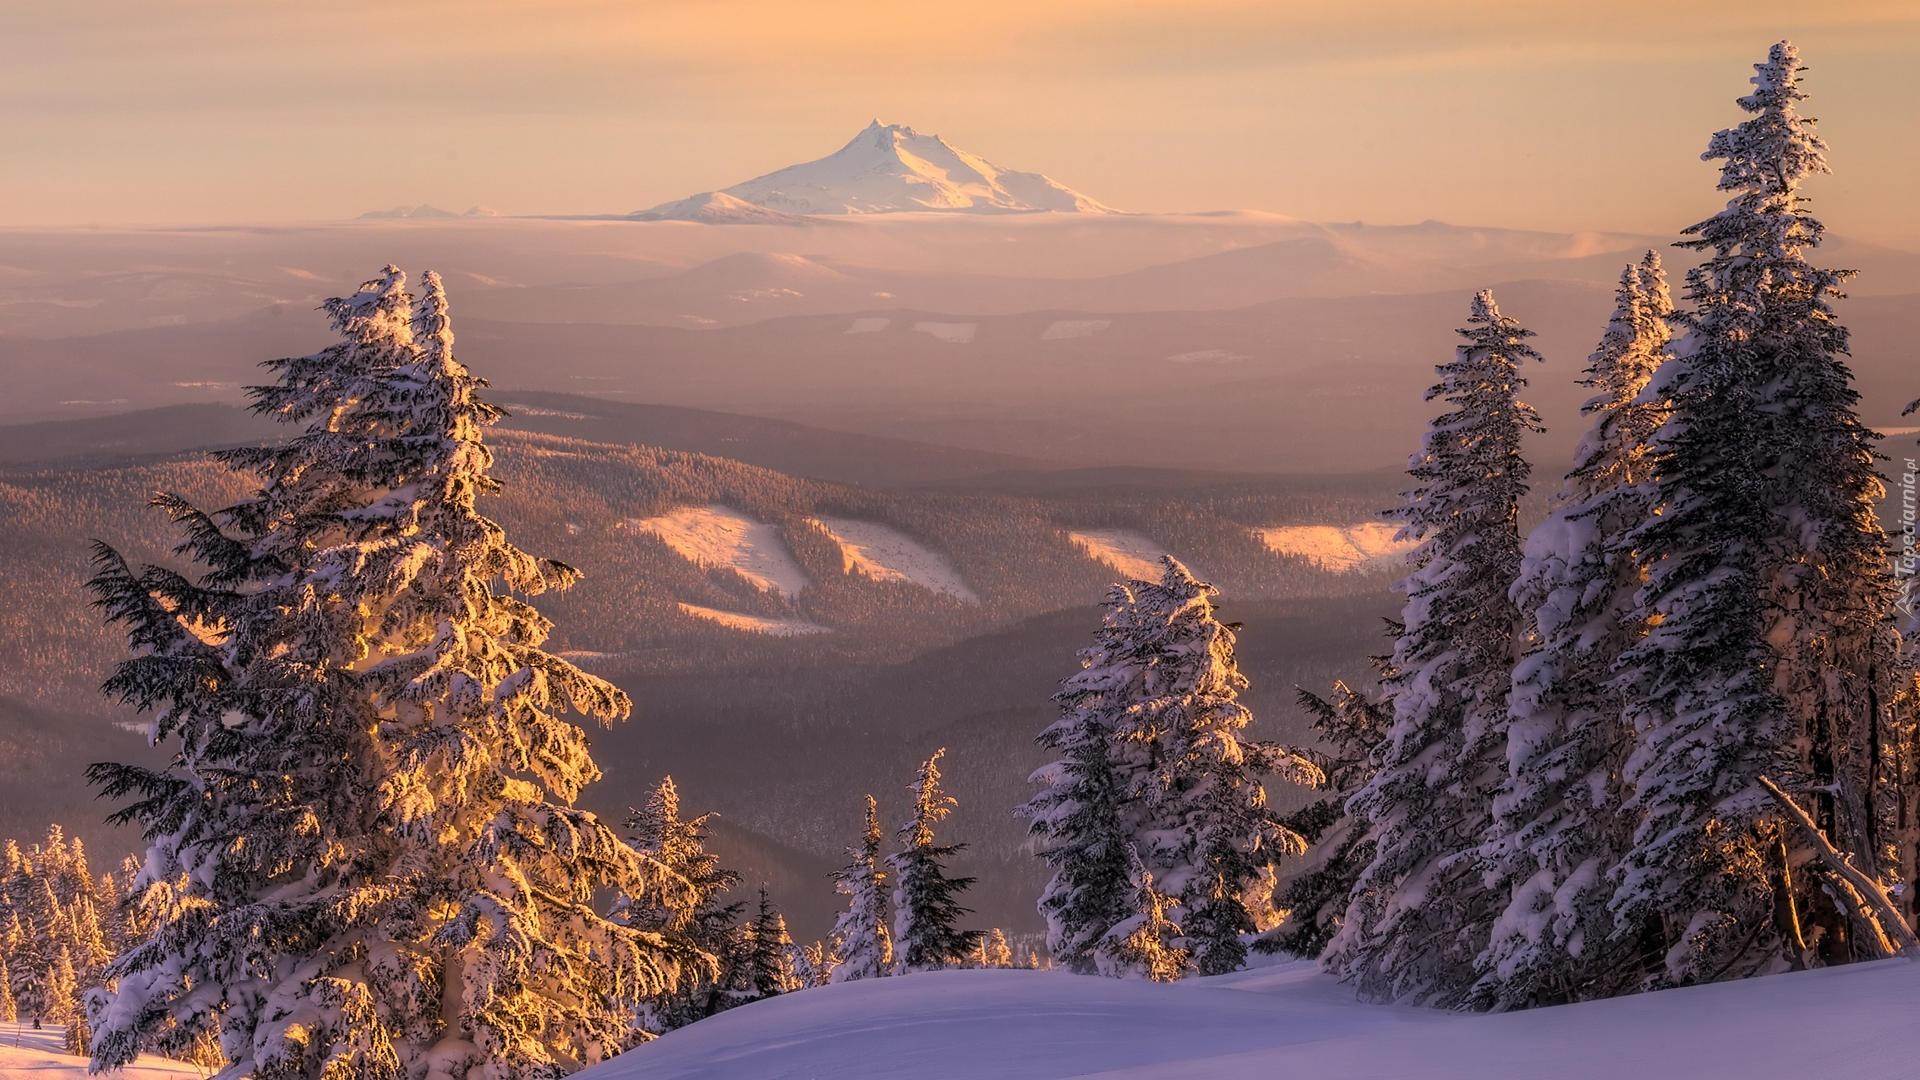 ели горы снег зима ate mountains snow winter загрузить